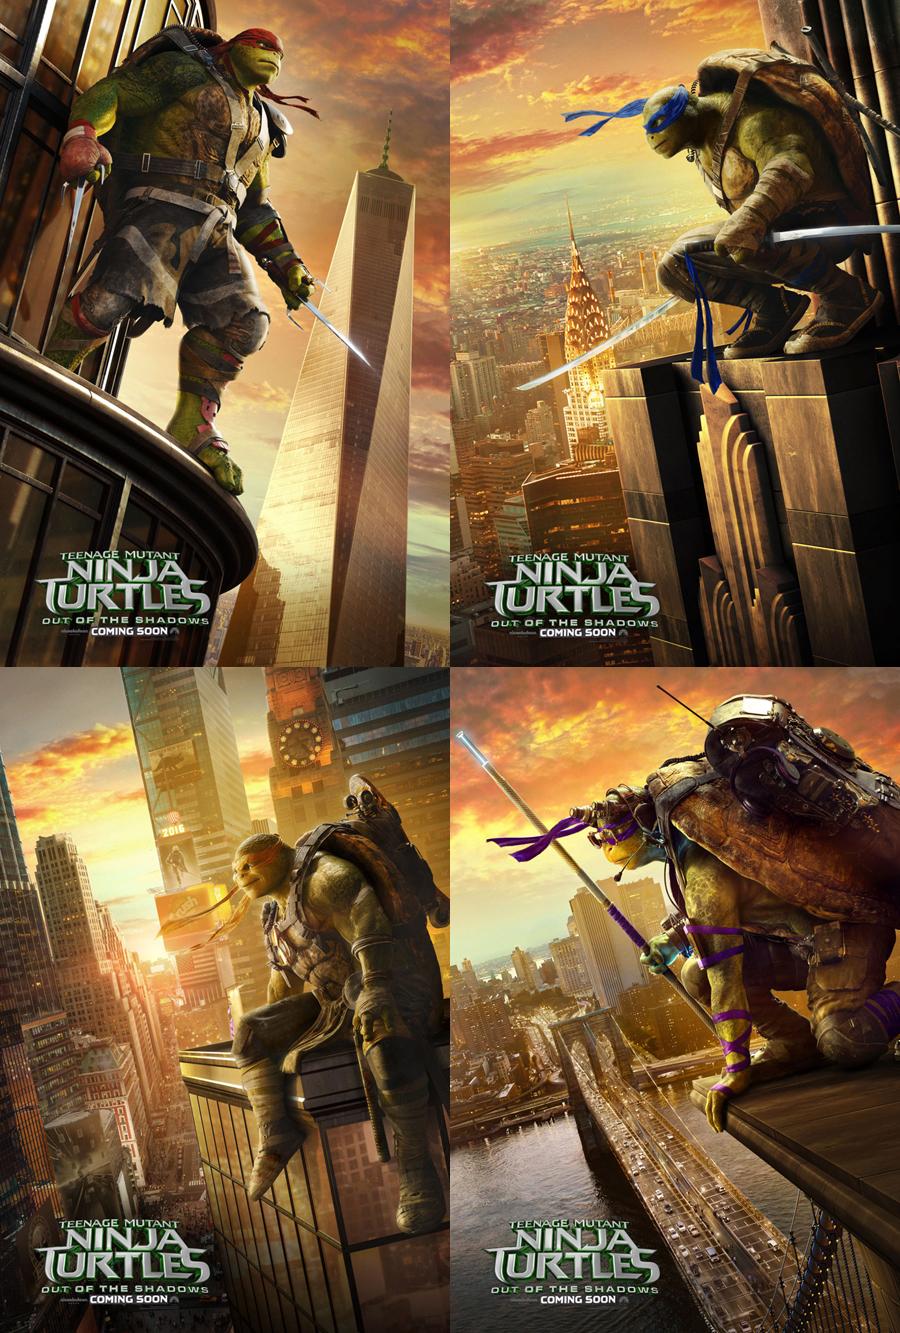 Teenage Mutant Ninja Turtles Out Of The Shadows Movie Poster Original Set 27x40 Ebay